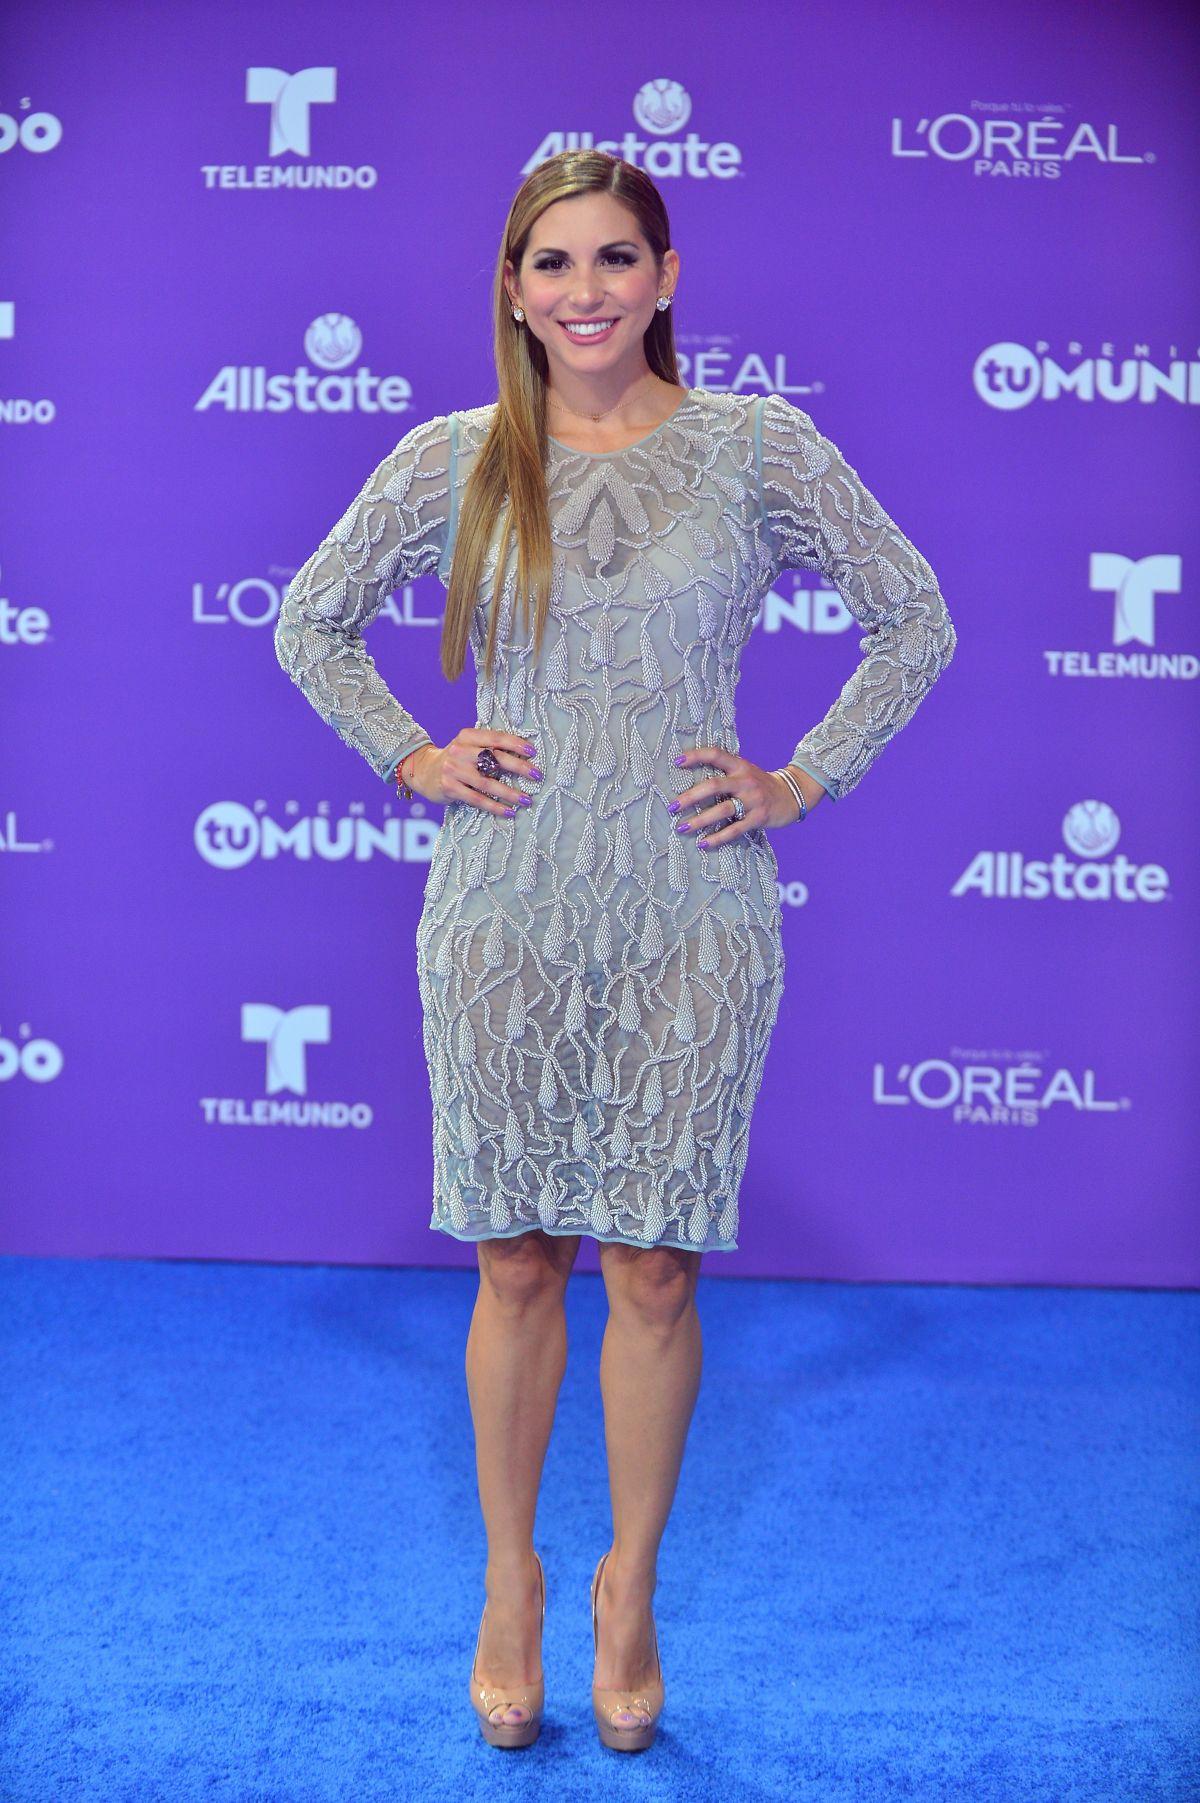 ALEXANDRA OLAVARRIA at Telemundo